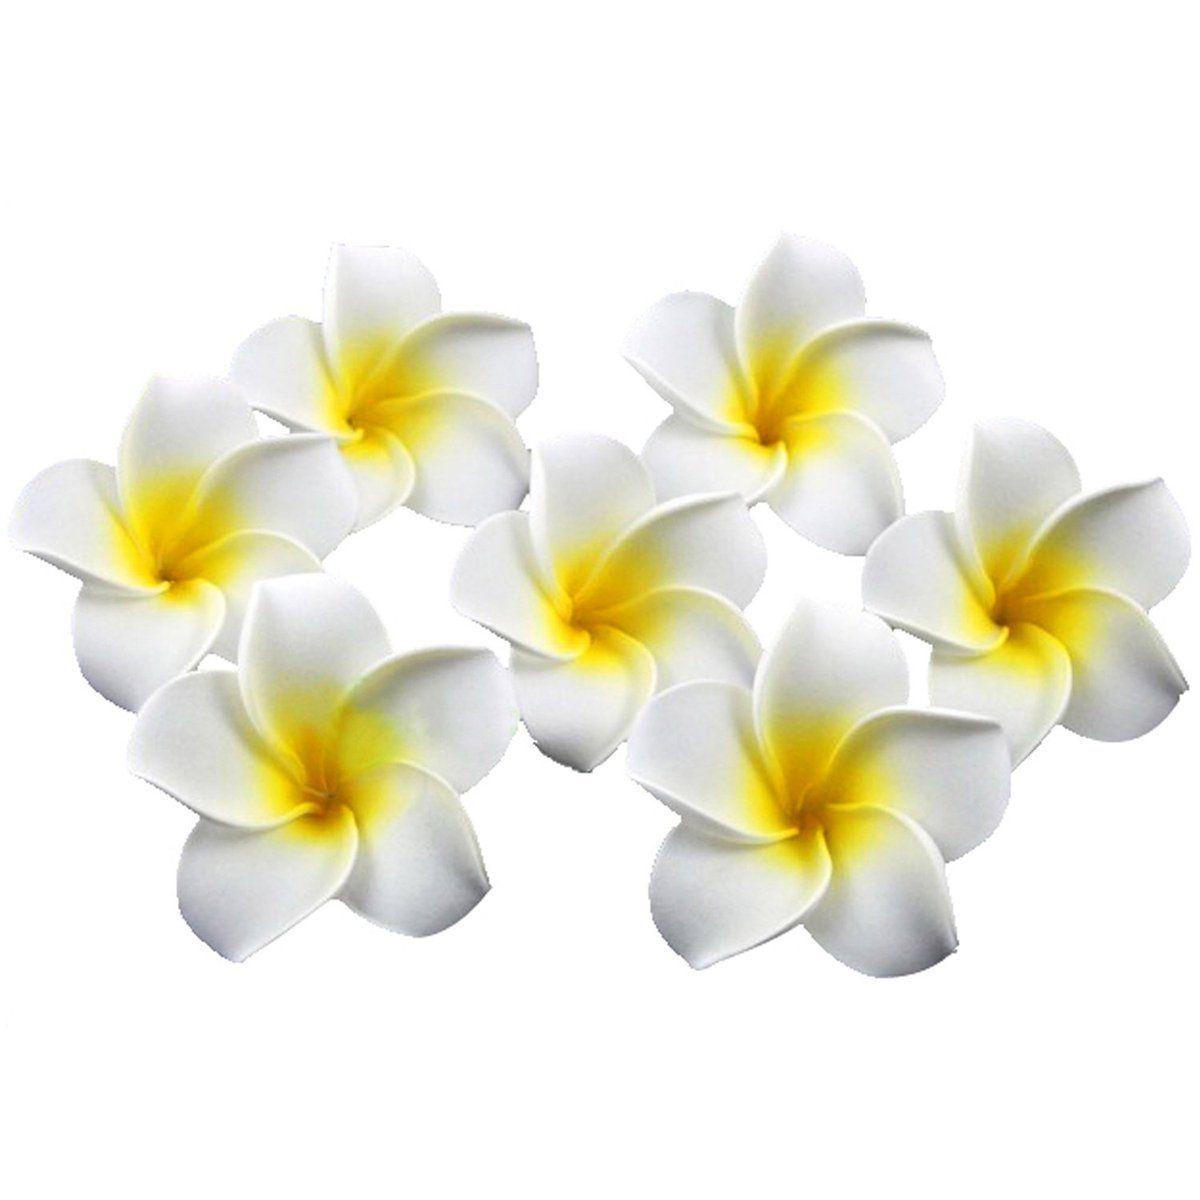 Pixnor Plumeria Hawaiian Foam Frangipani Flower For Wedding Party